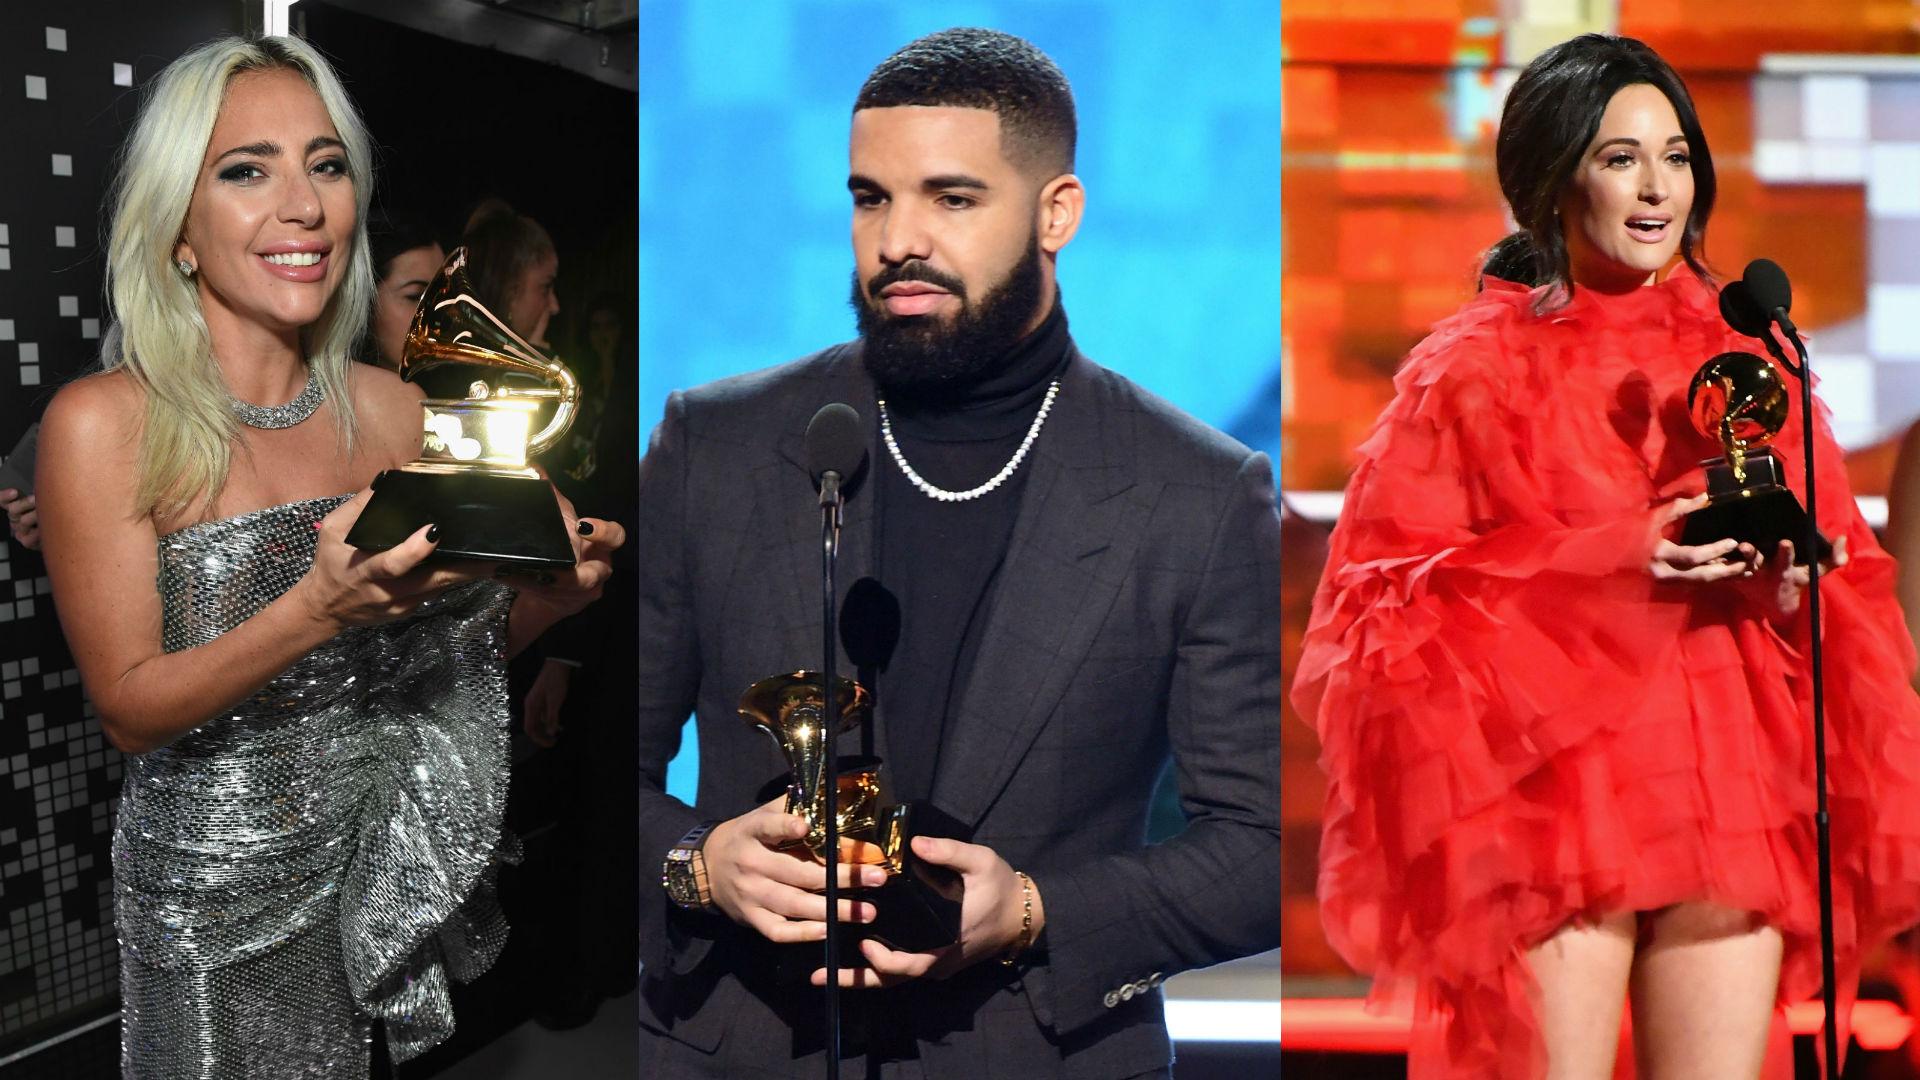 Grammy Awards 2019 Winners: Grammy Awards 2019 Winners: The Complete List